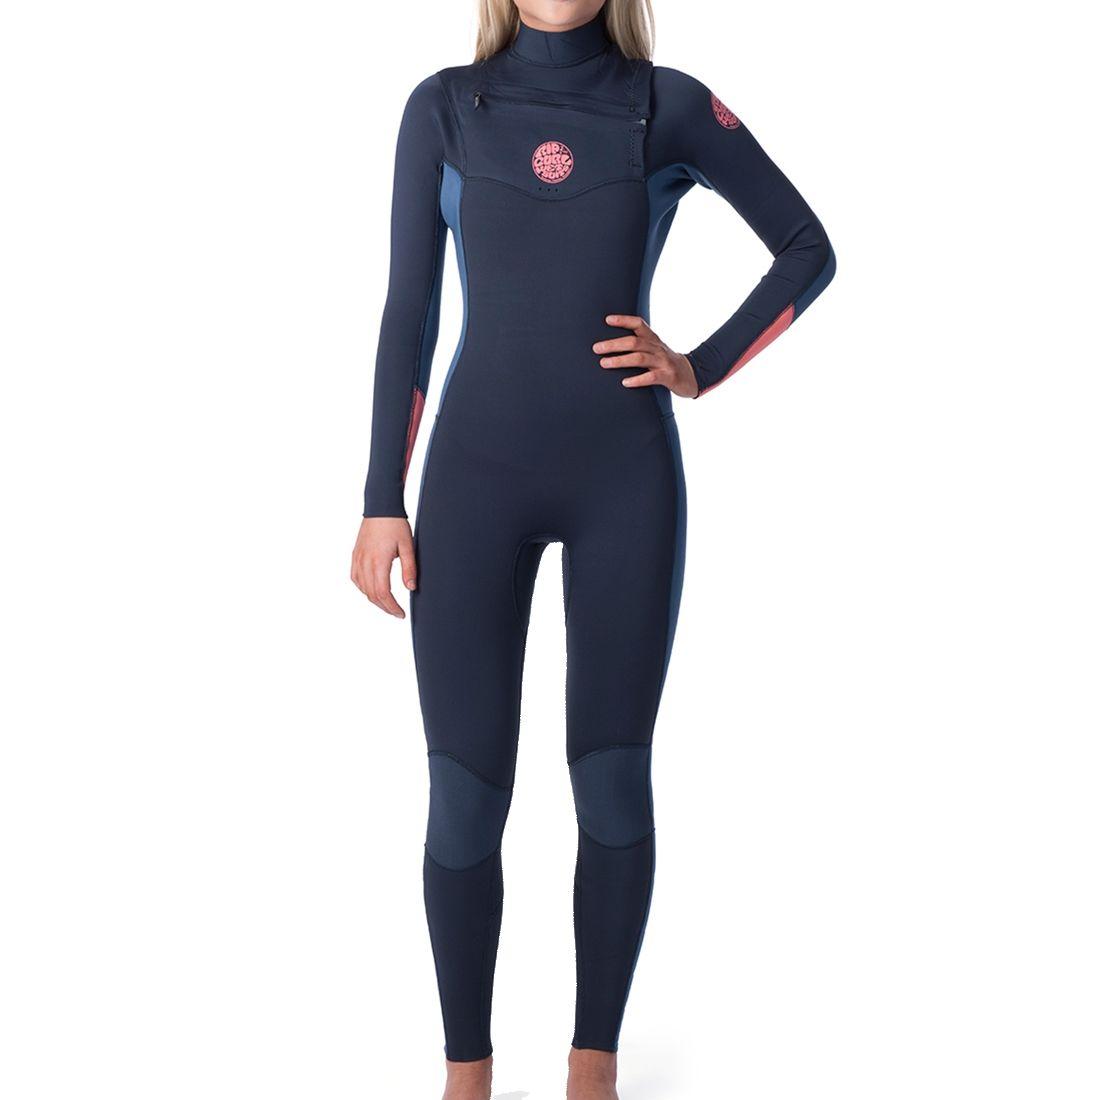 Rip Curl Womens Dawn Patrol Chest Zip 3//2 Wetsuit